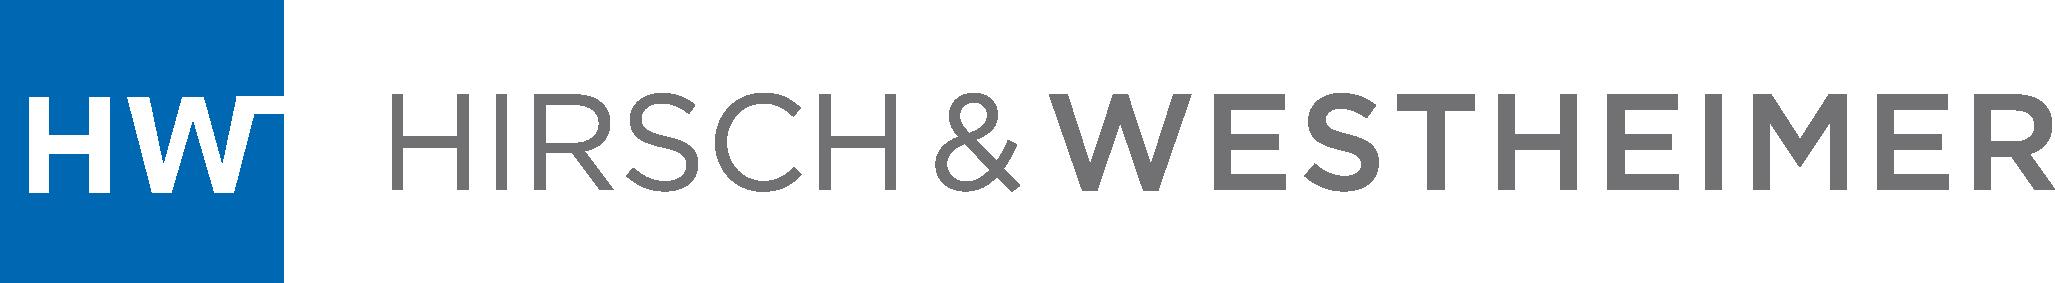 Hirsch & Westheimer, P.C. – Attorneys and Counselors since 1913.